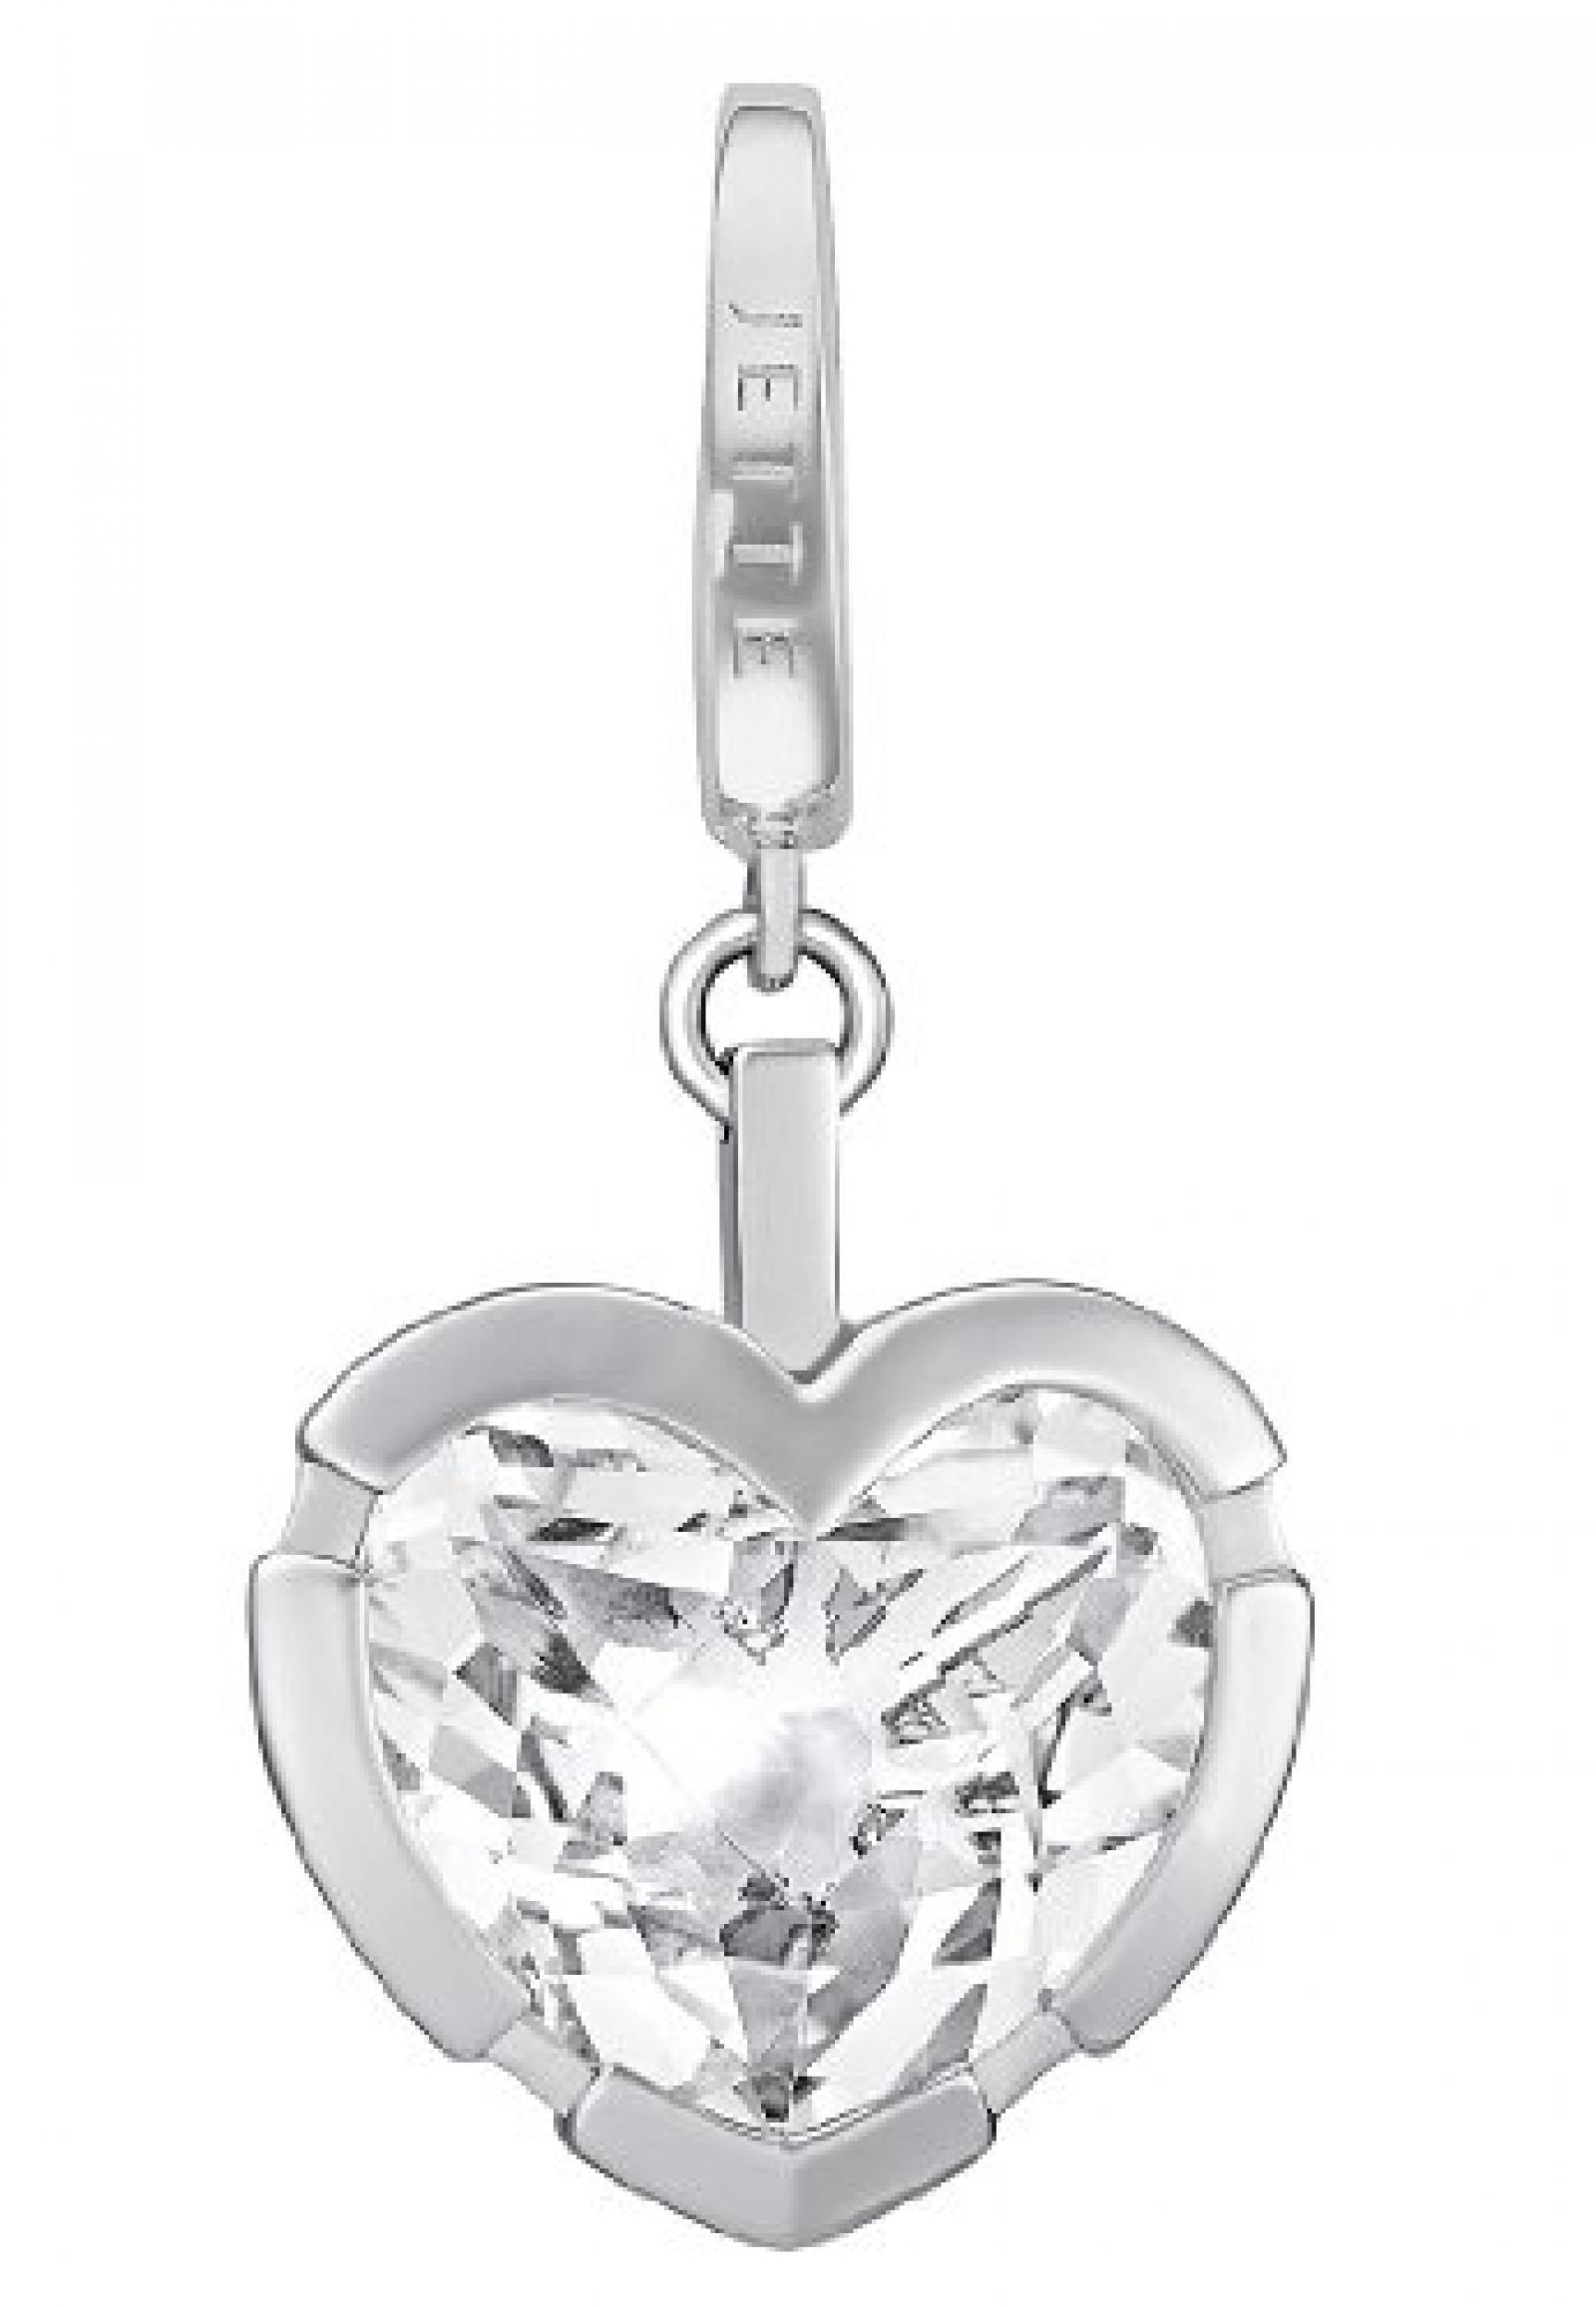 JETTE Charms Damen-Charm CHARM 925er Silber rhodiniert 1 Quarz One Size, silber